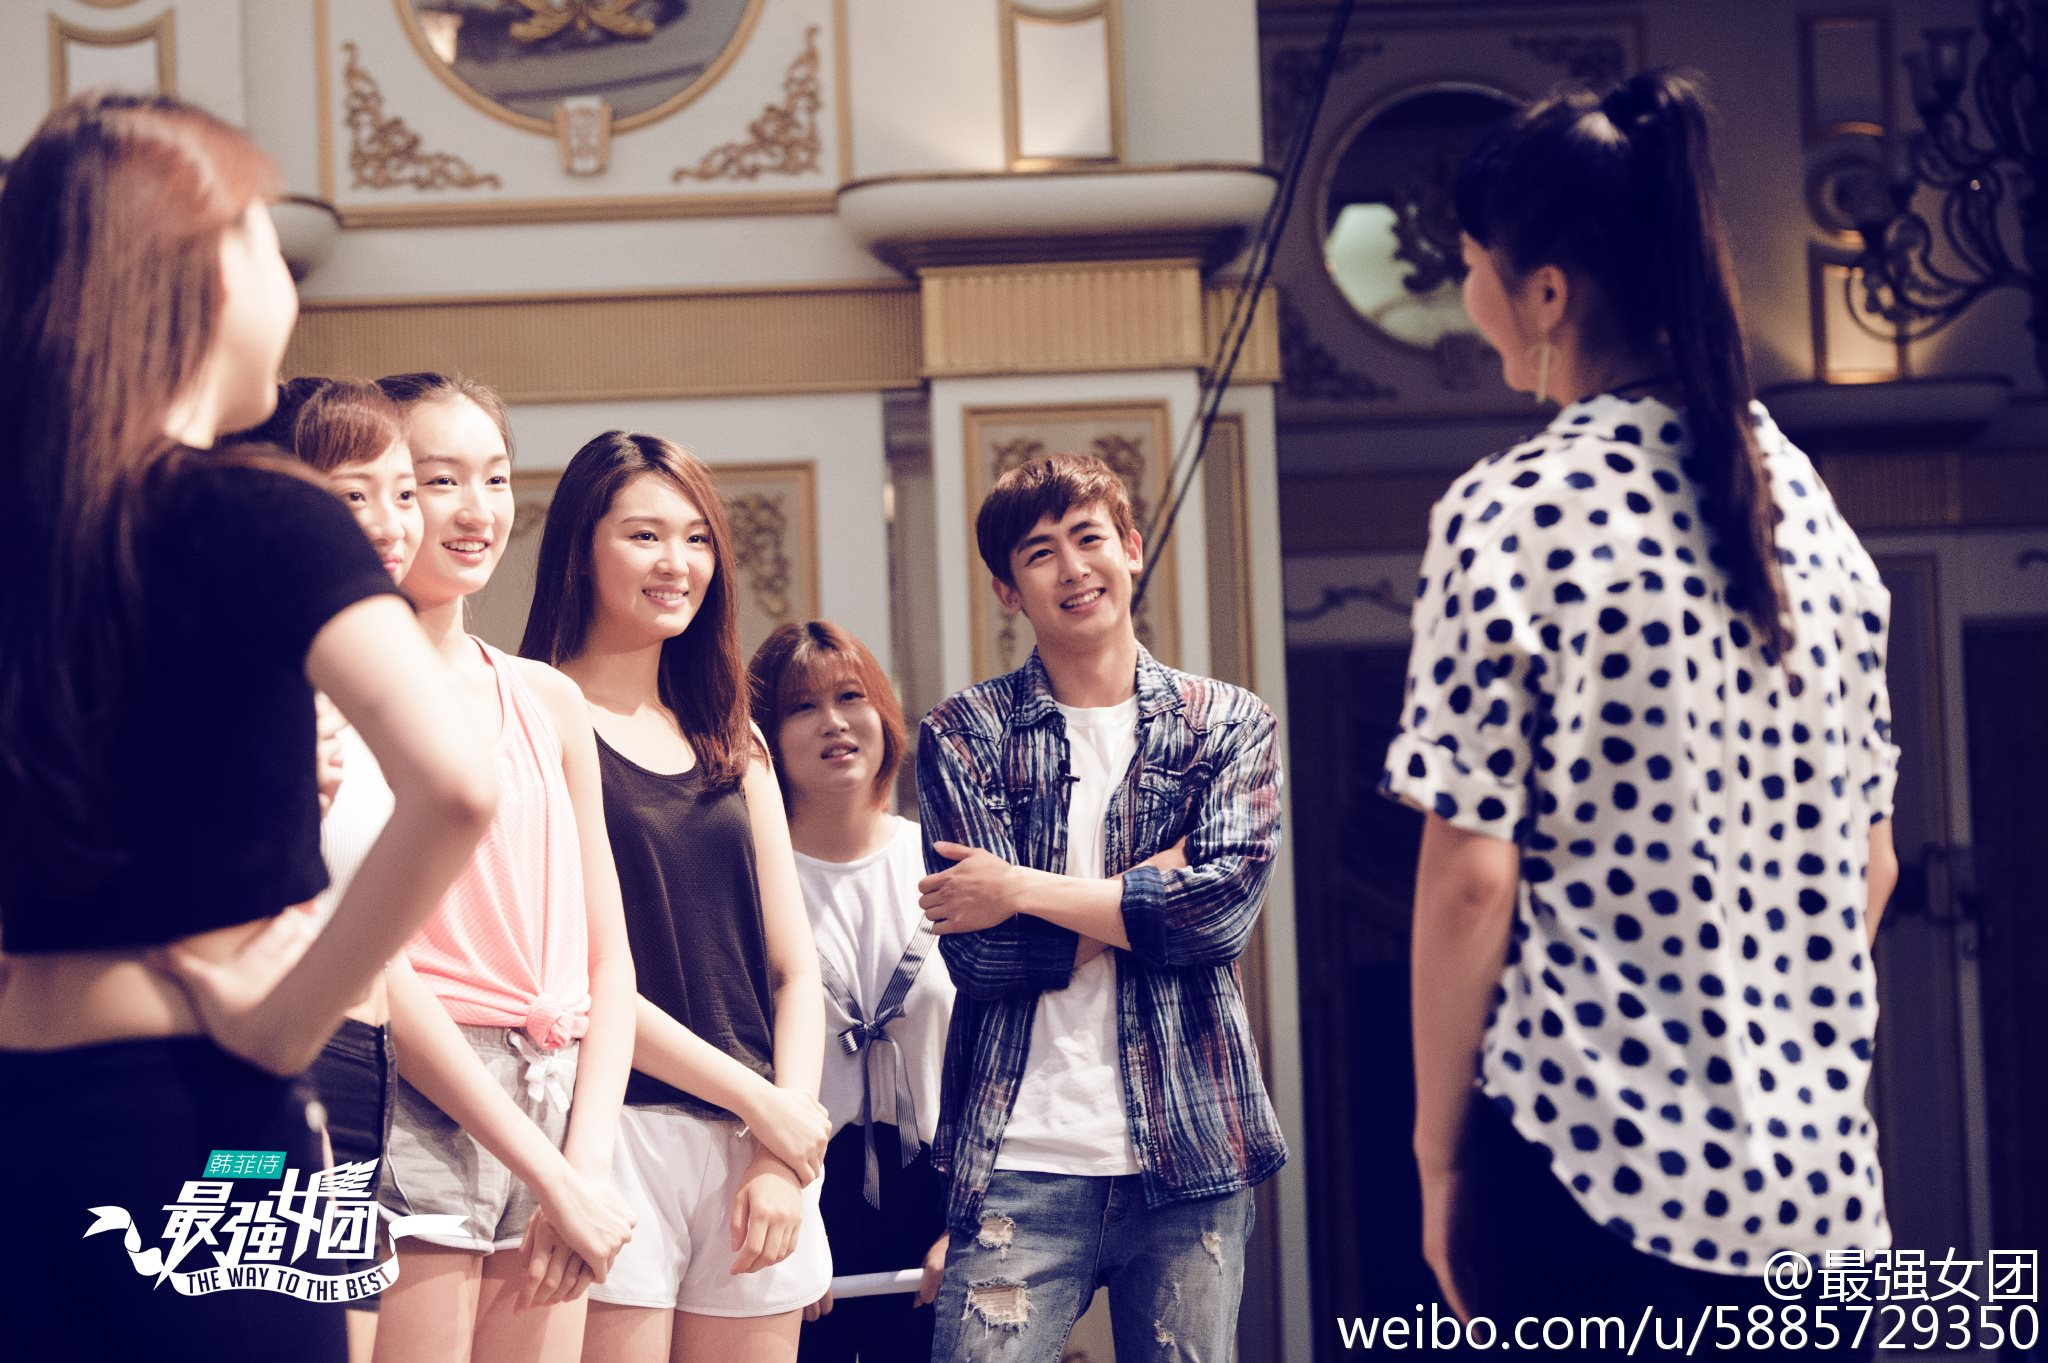 [STREAM] 160911 The Strongest Girl Group / 最强女团 EP12 (Nichkhun) https://t.co/kIOPAbkyHS https://t.co/qhxdFXeCLL